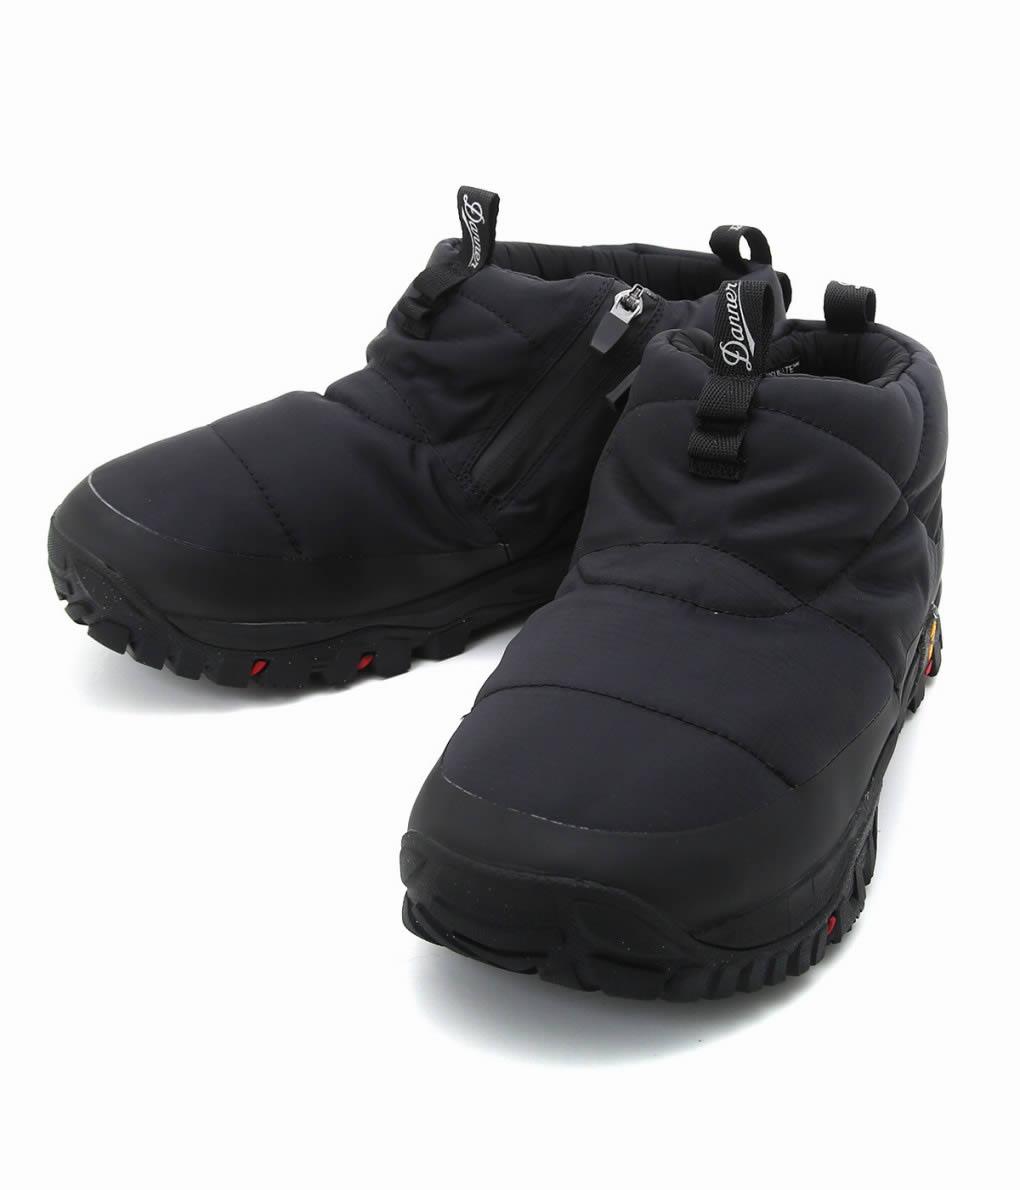 Danner / ダナー : FREDDO MIDDLE B200 / 全2色 : ブーツ スノーシューズ レインシューズ スノーブーツ レインシューズ フレッド ミドル メンズ : D120035 【STD】【REA】